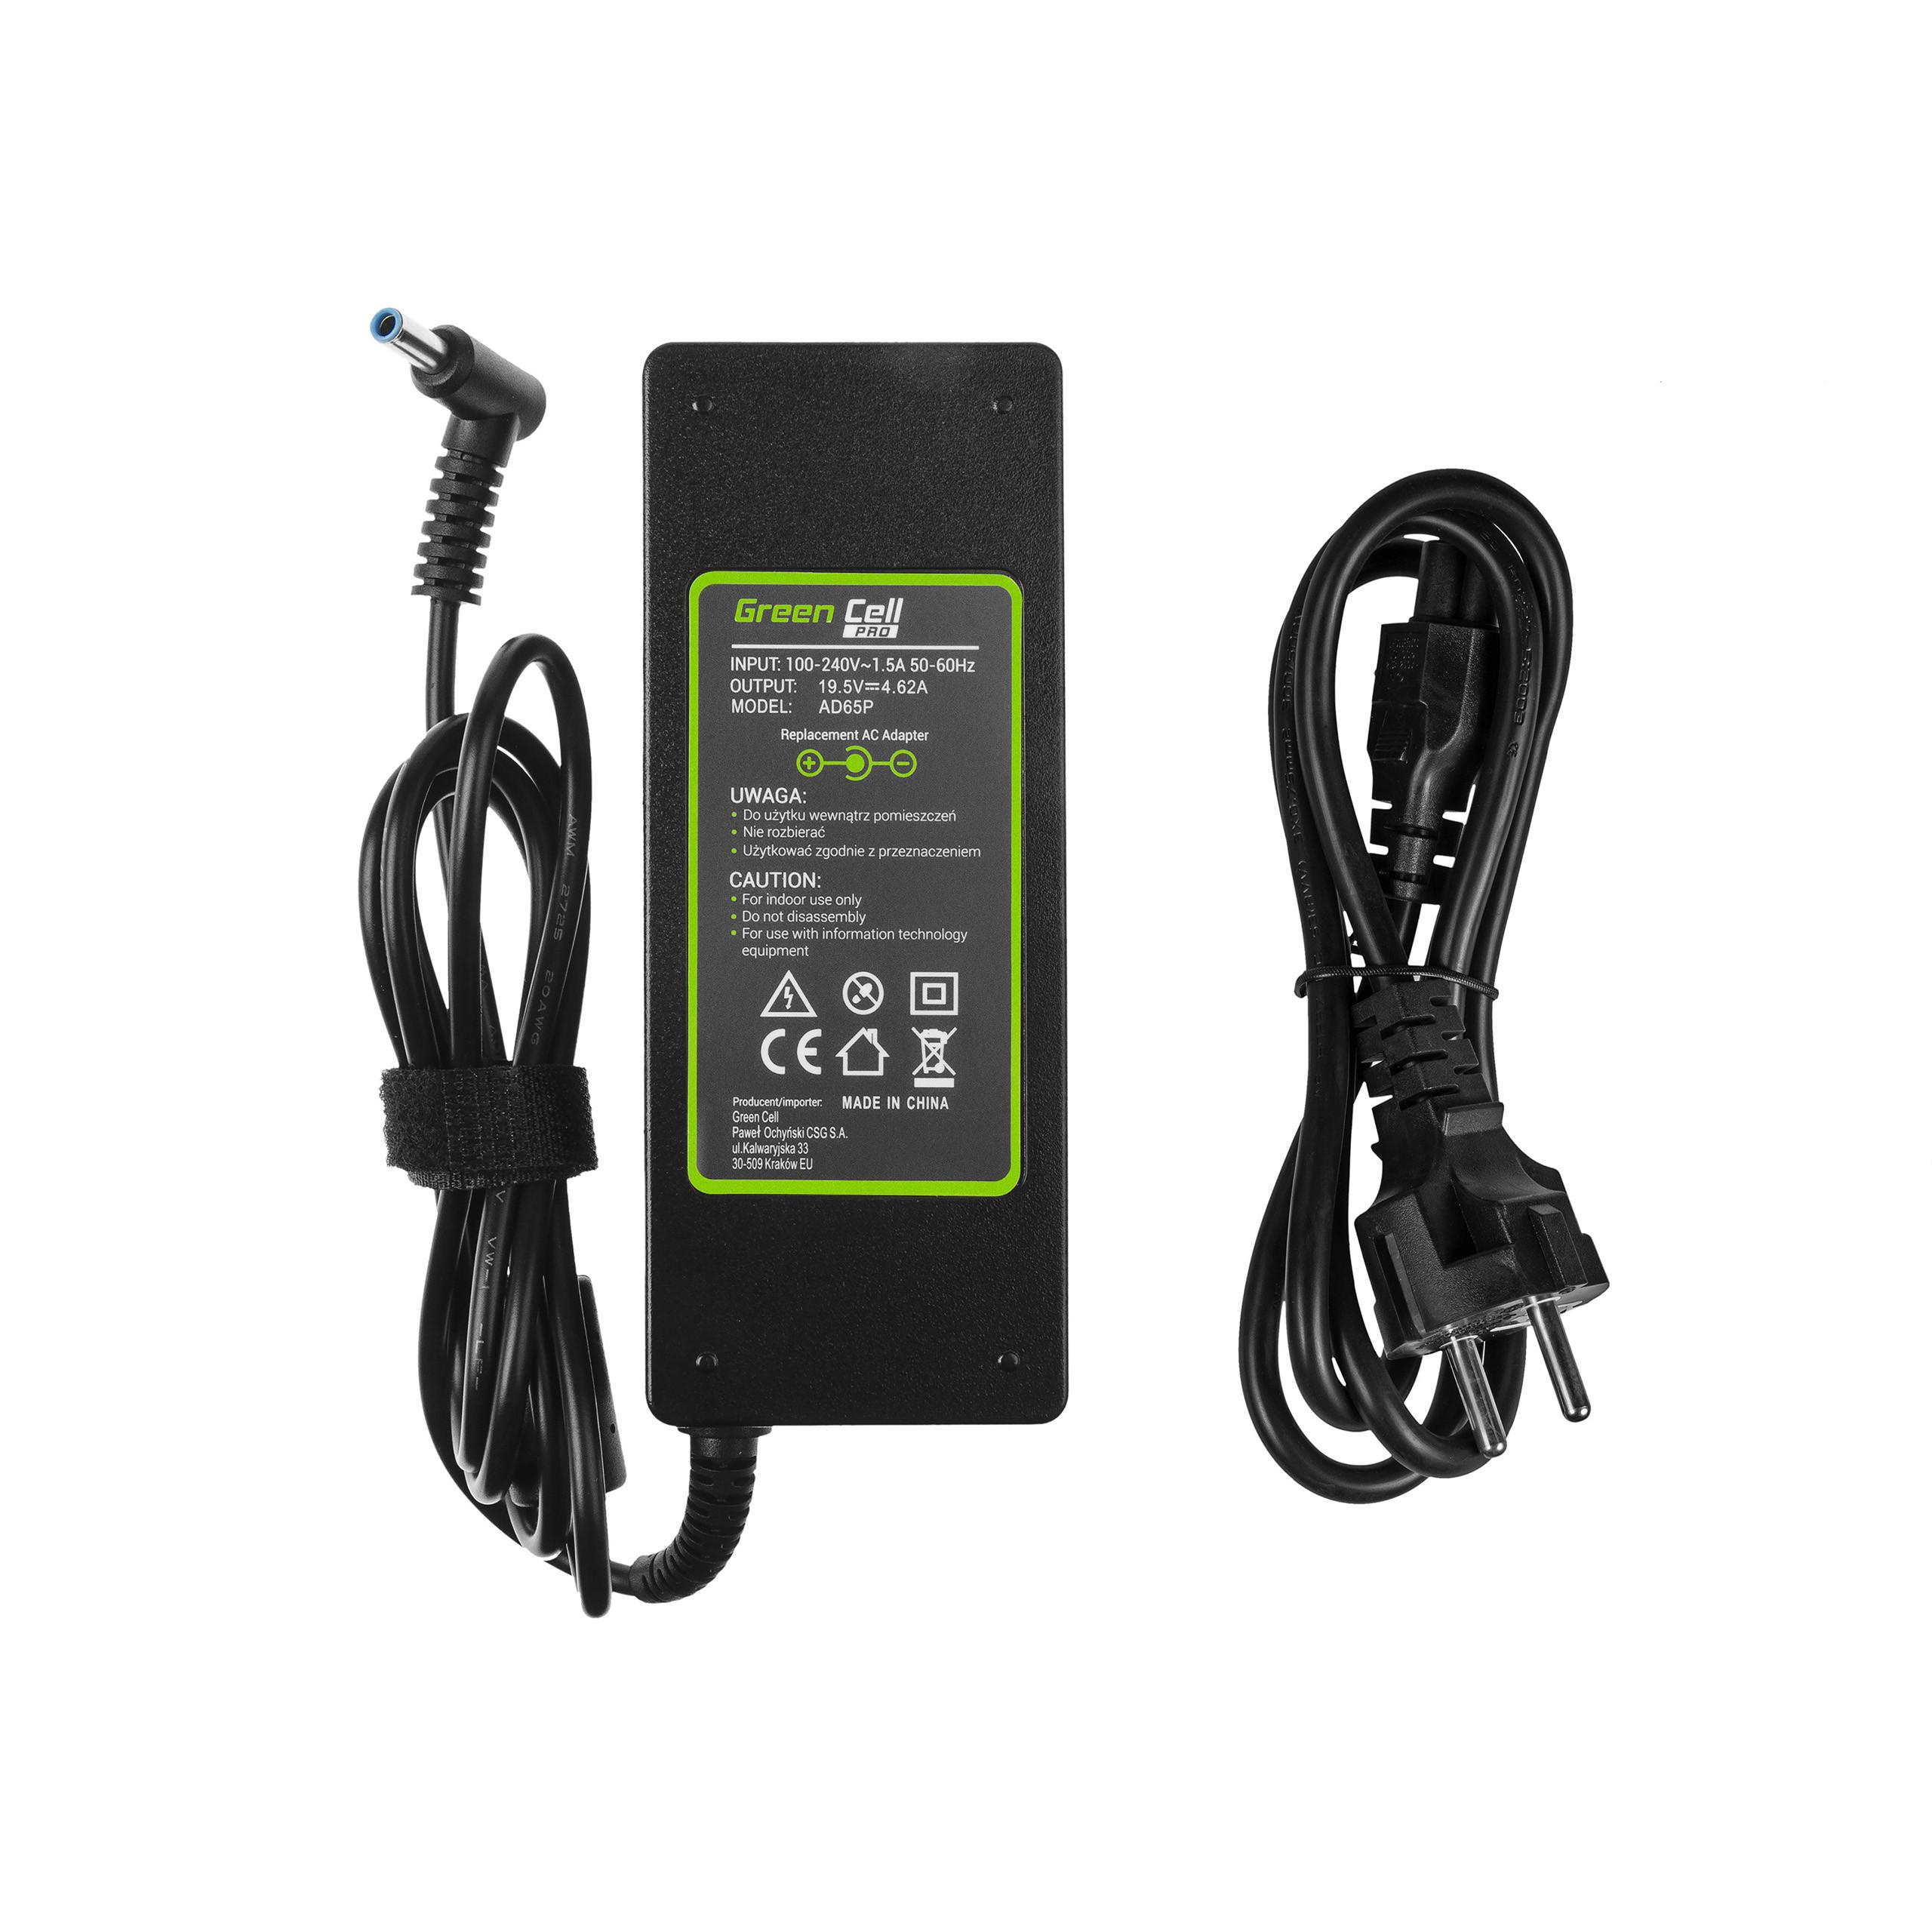 Green Cell AD65P Nabíječka k notebookům HP Pavilion a Compaq 14, 15 a 17 | 19.5V | 4.62A | 90W | konektor 4.5mm-3.0mm Pin